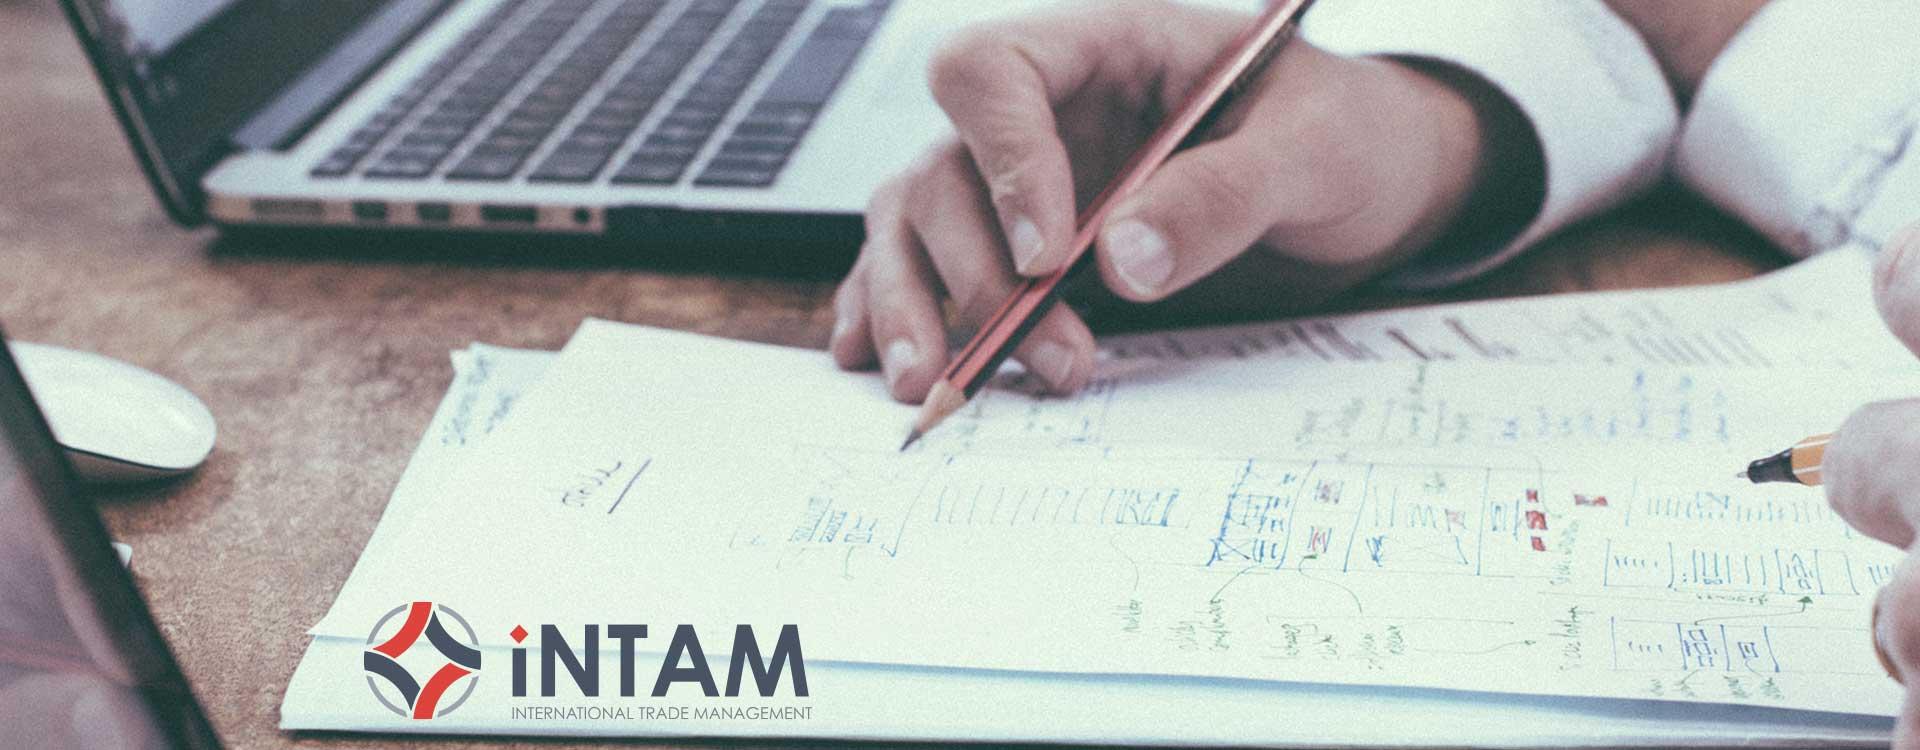 Post iNTAM,  International business consultant